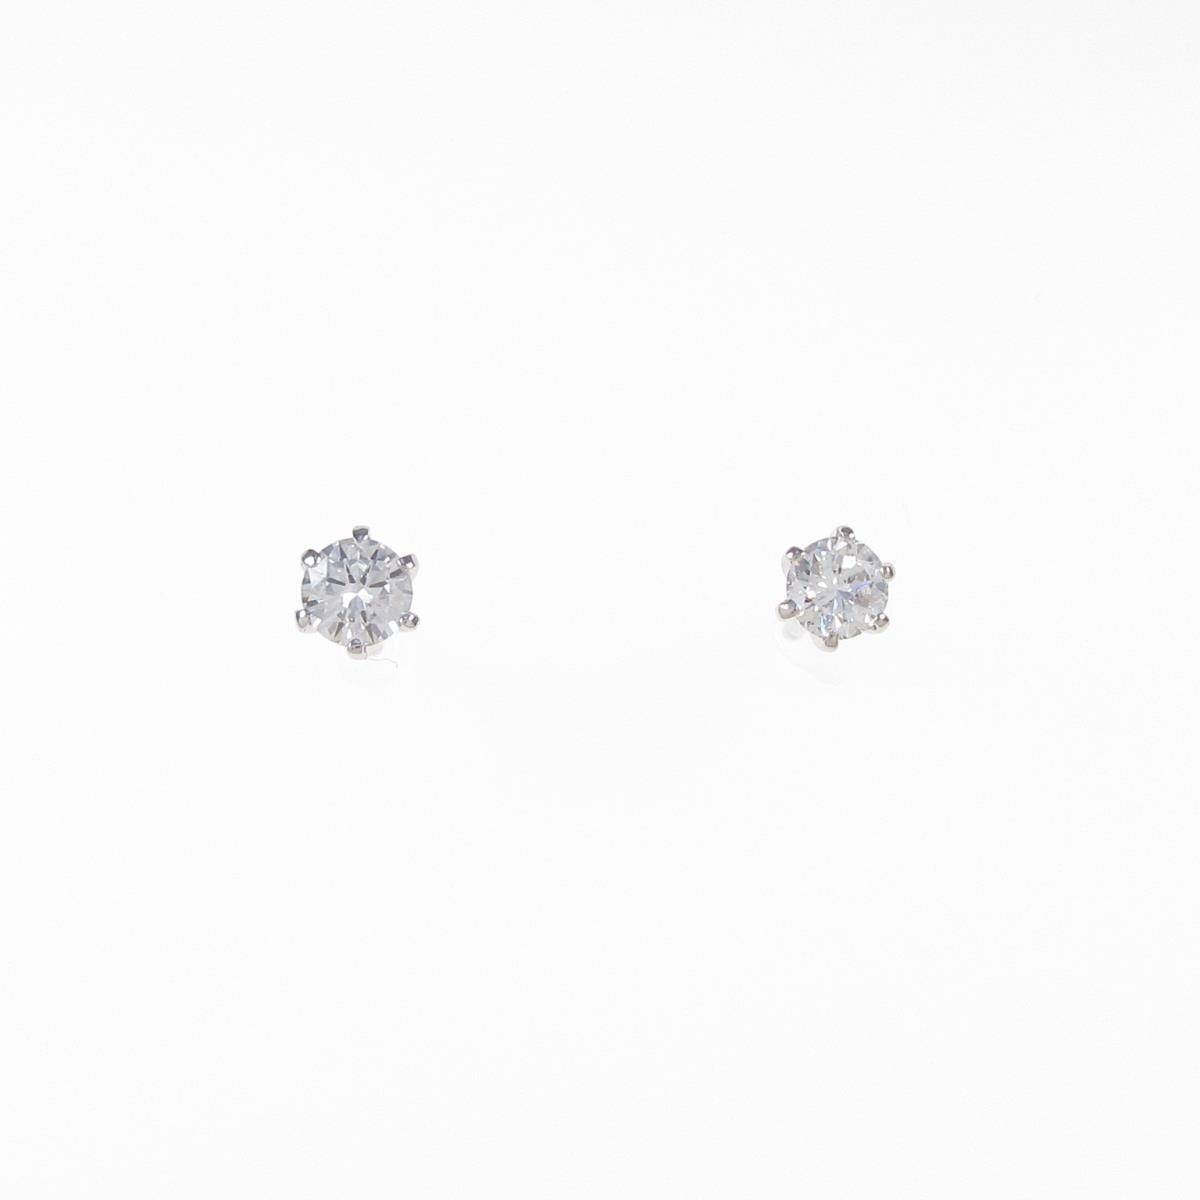 K18WG ダイヤモンドピアス 0.226ct・0.228ct・D-E・VVS1-2・GOOD【中古】